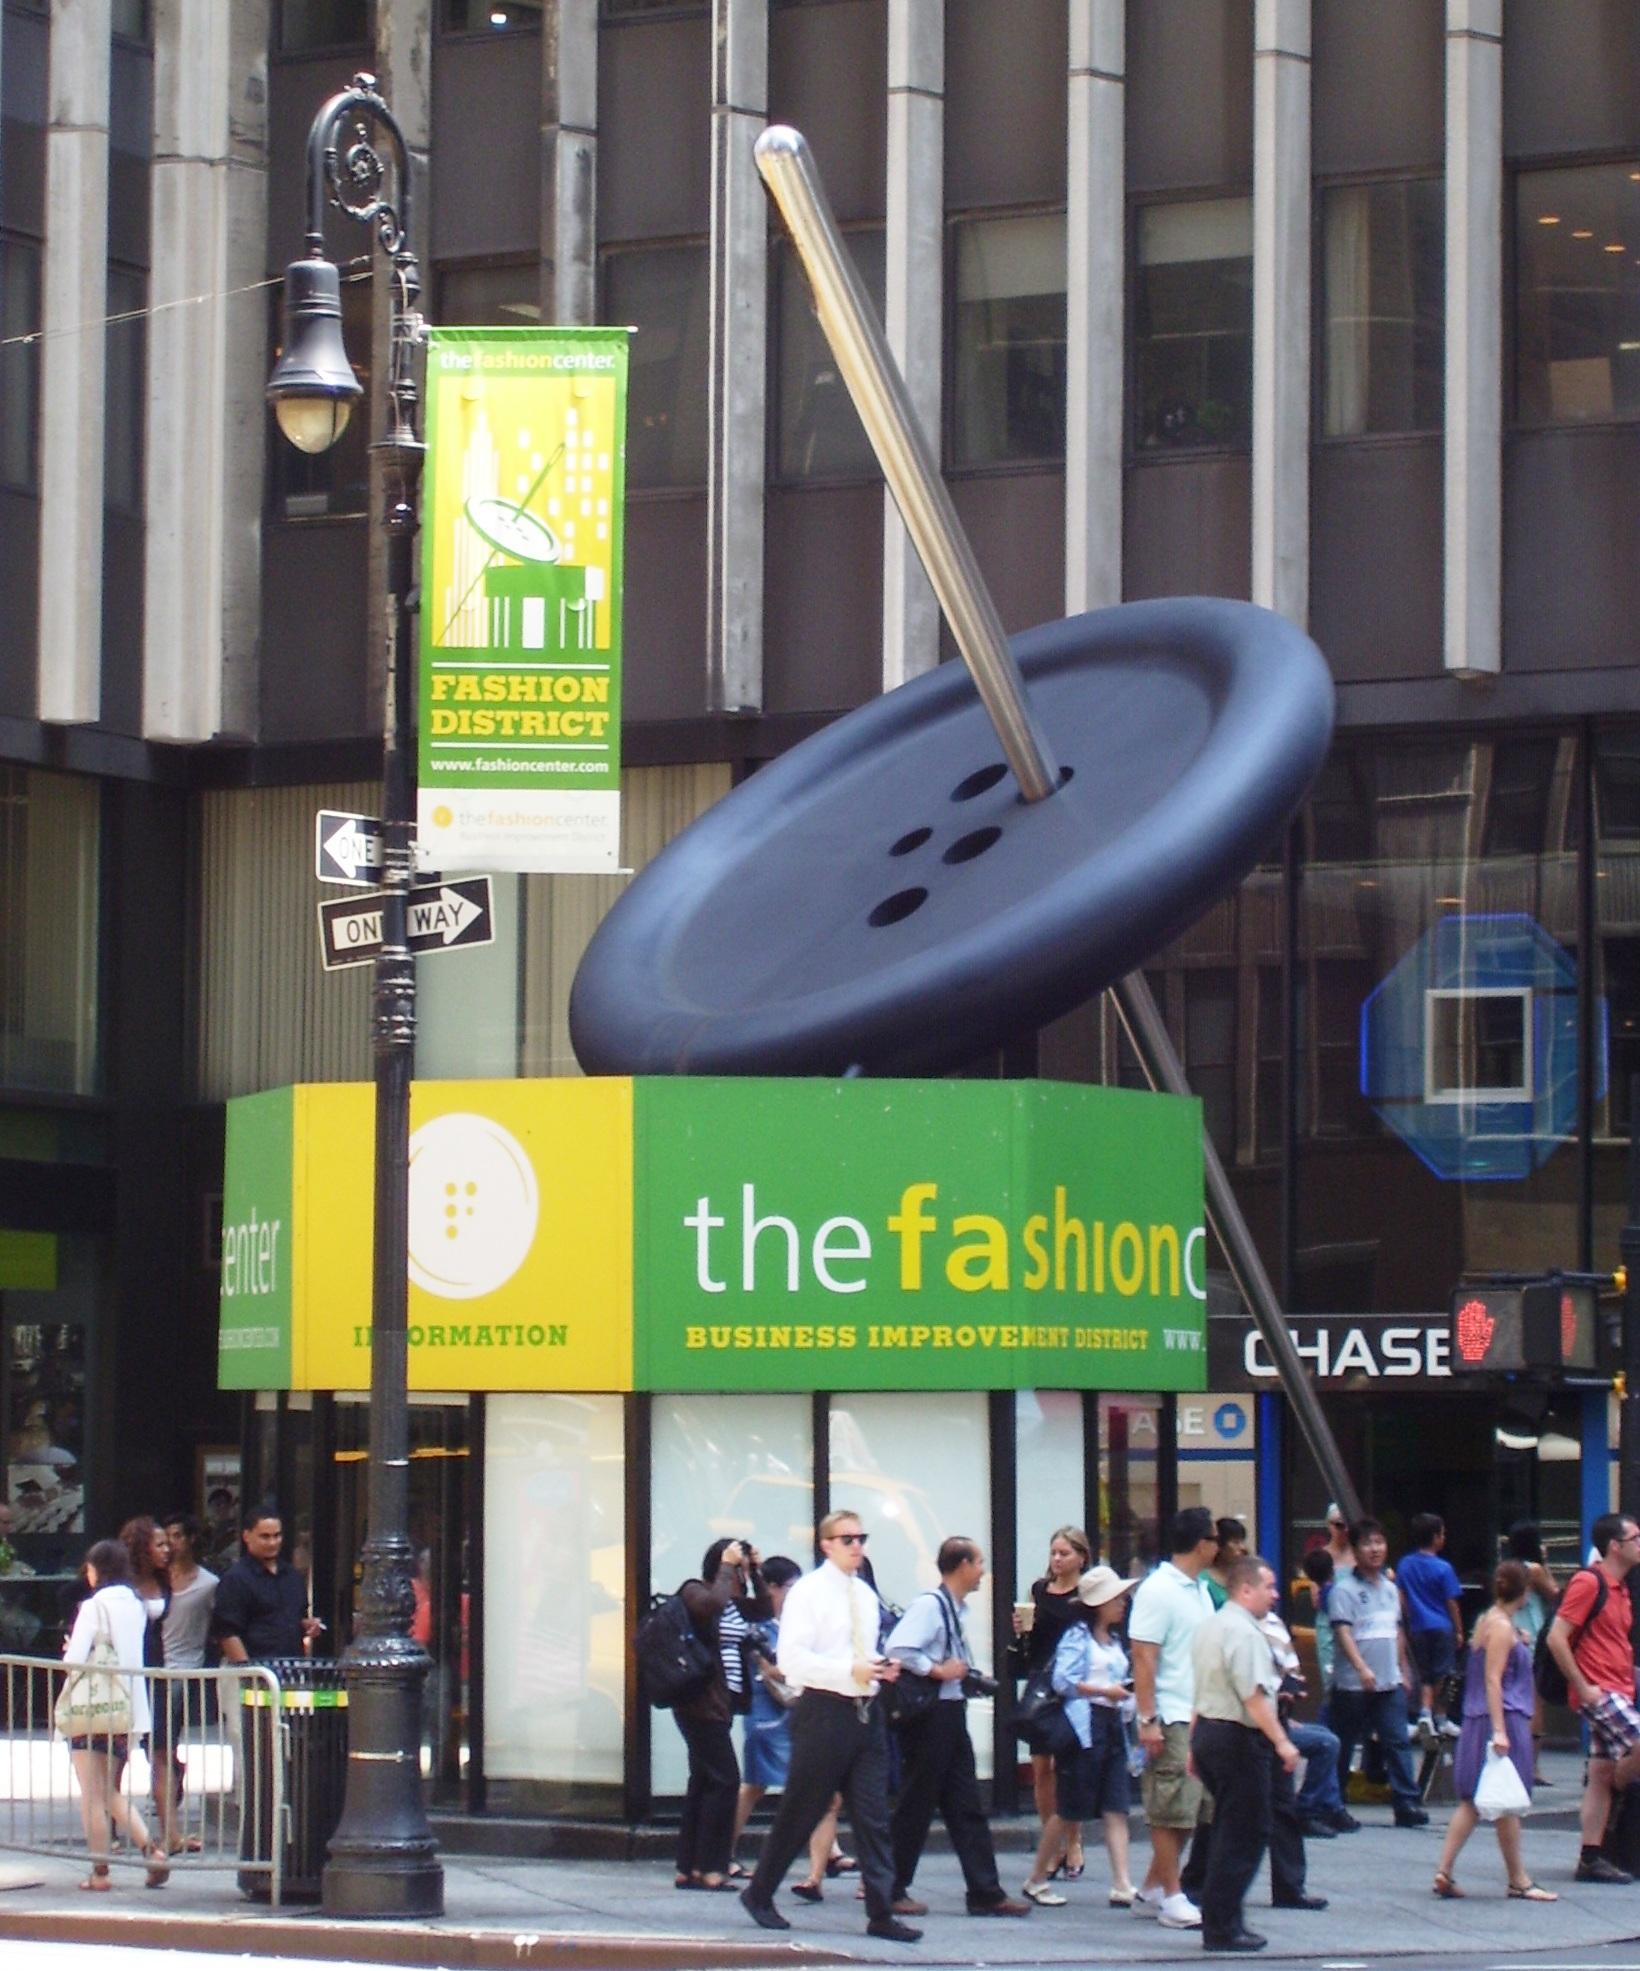 Fashion District of New York City